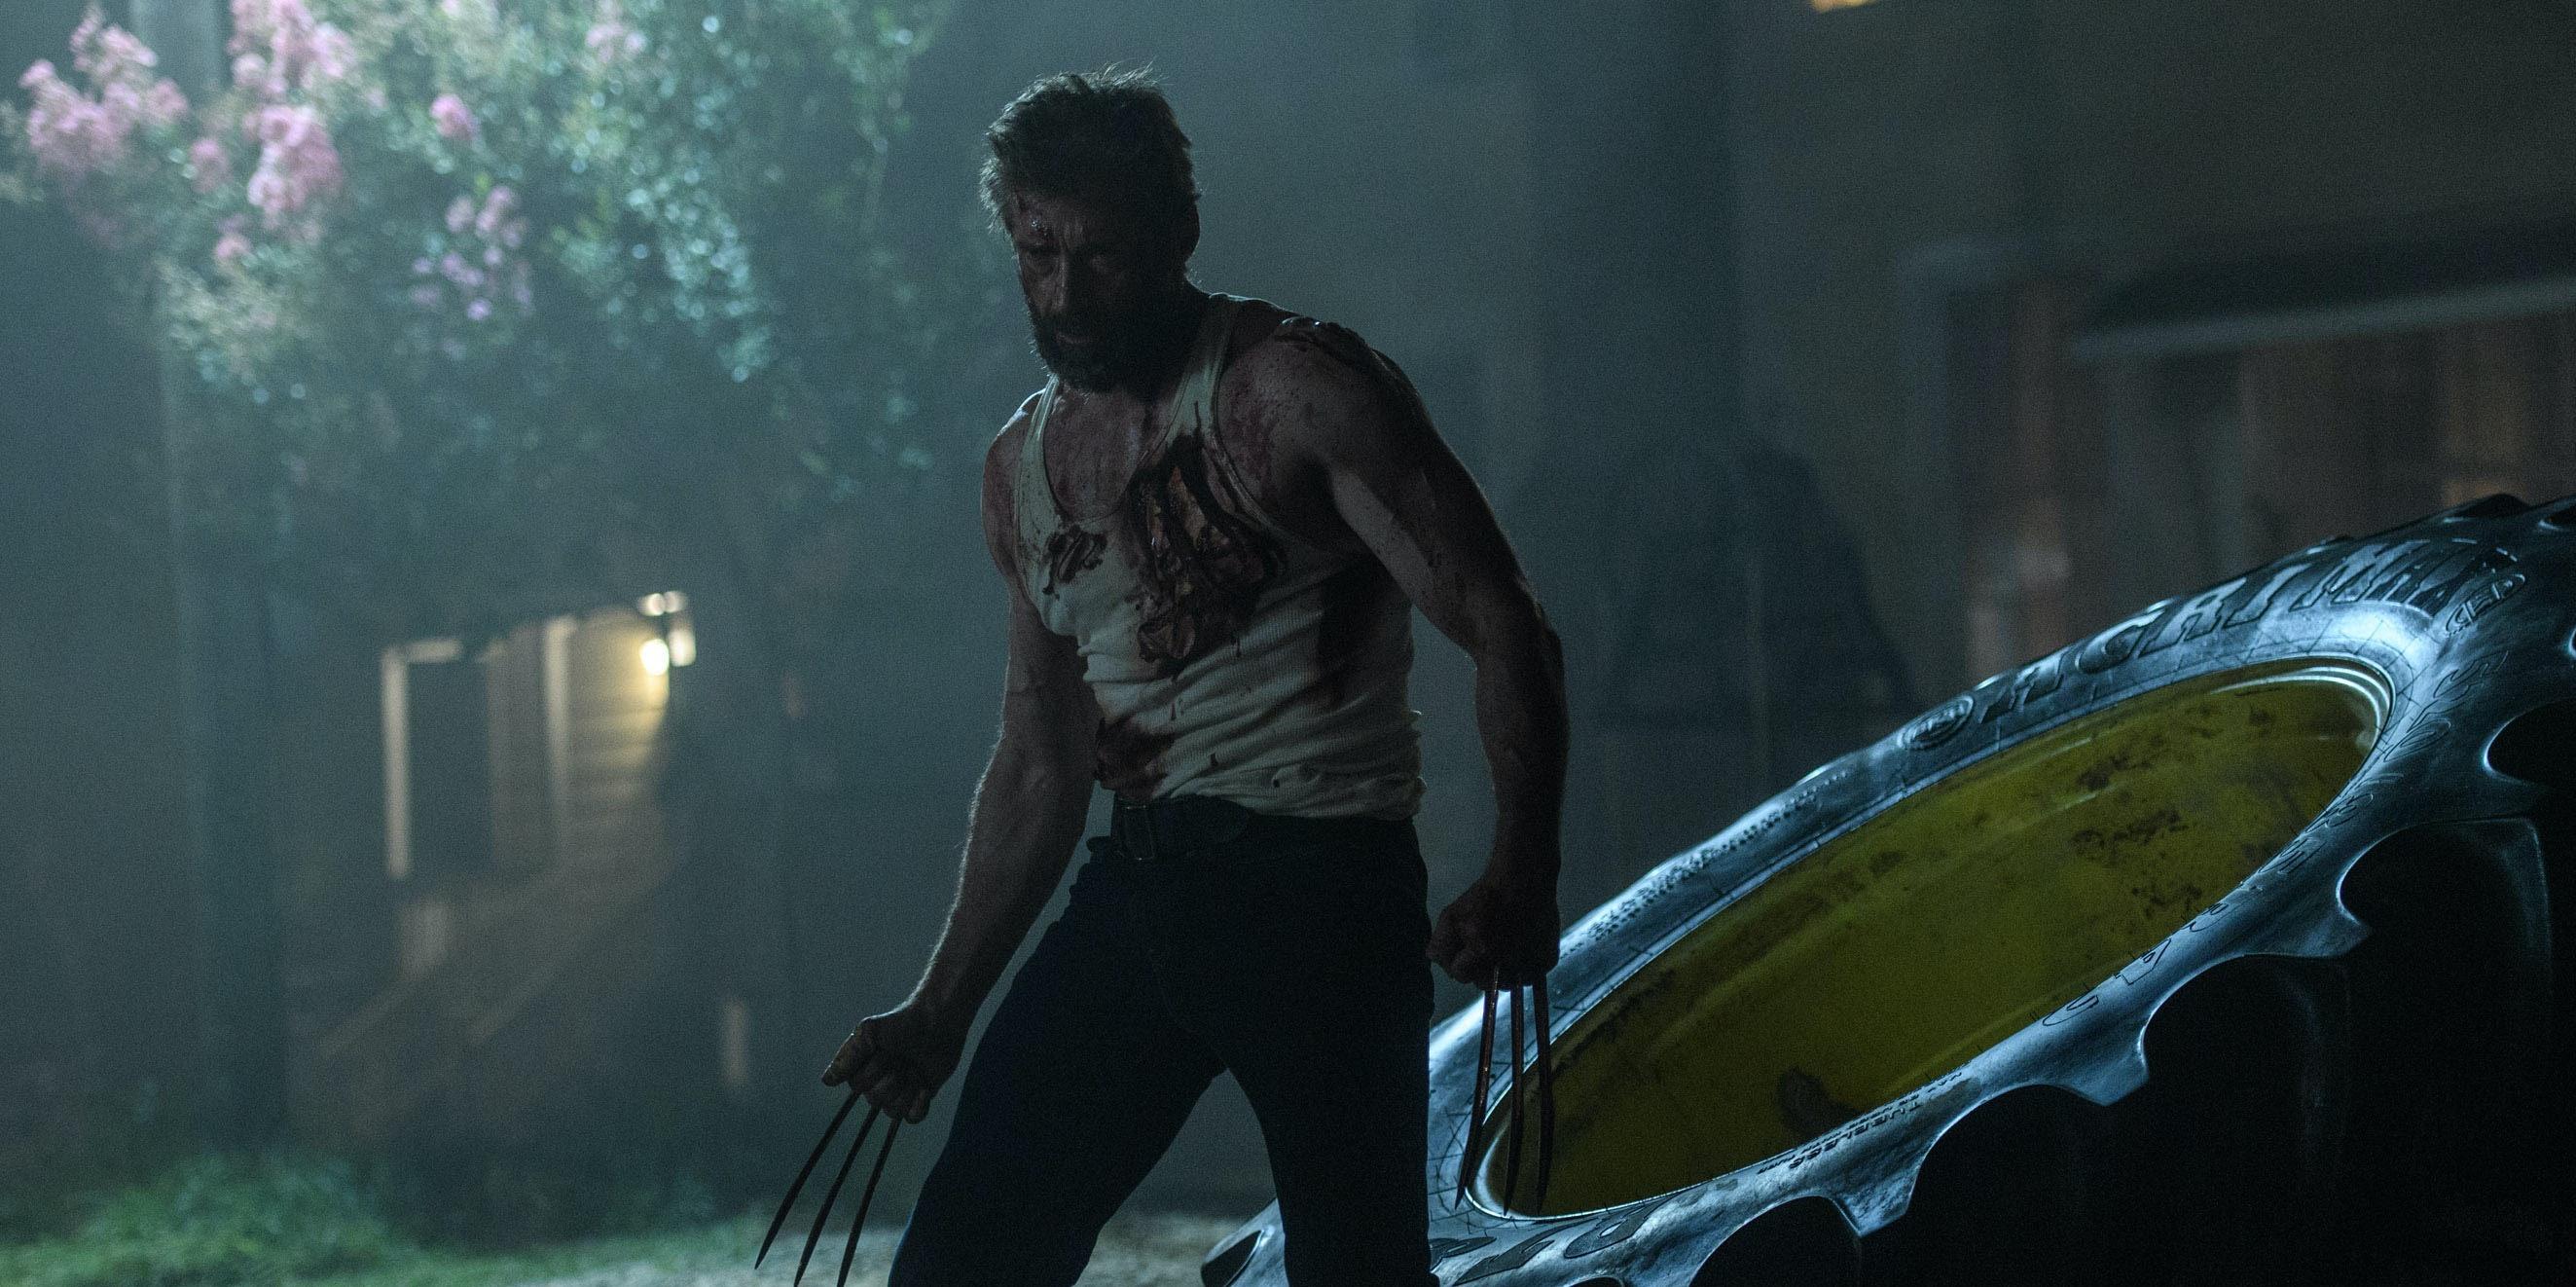 Hugh Jackman Swears He'll Never, Ever Play Wolverine Again